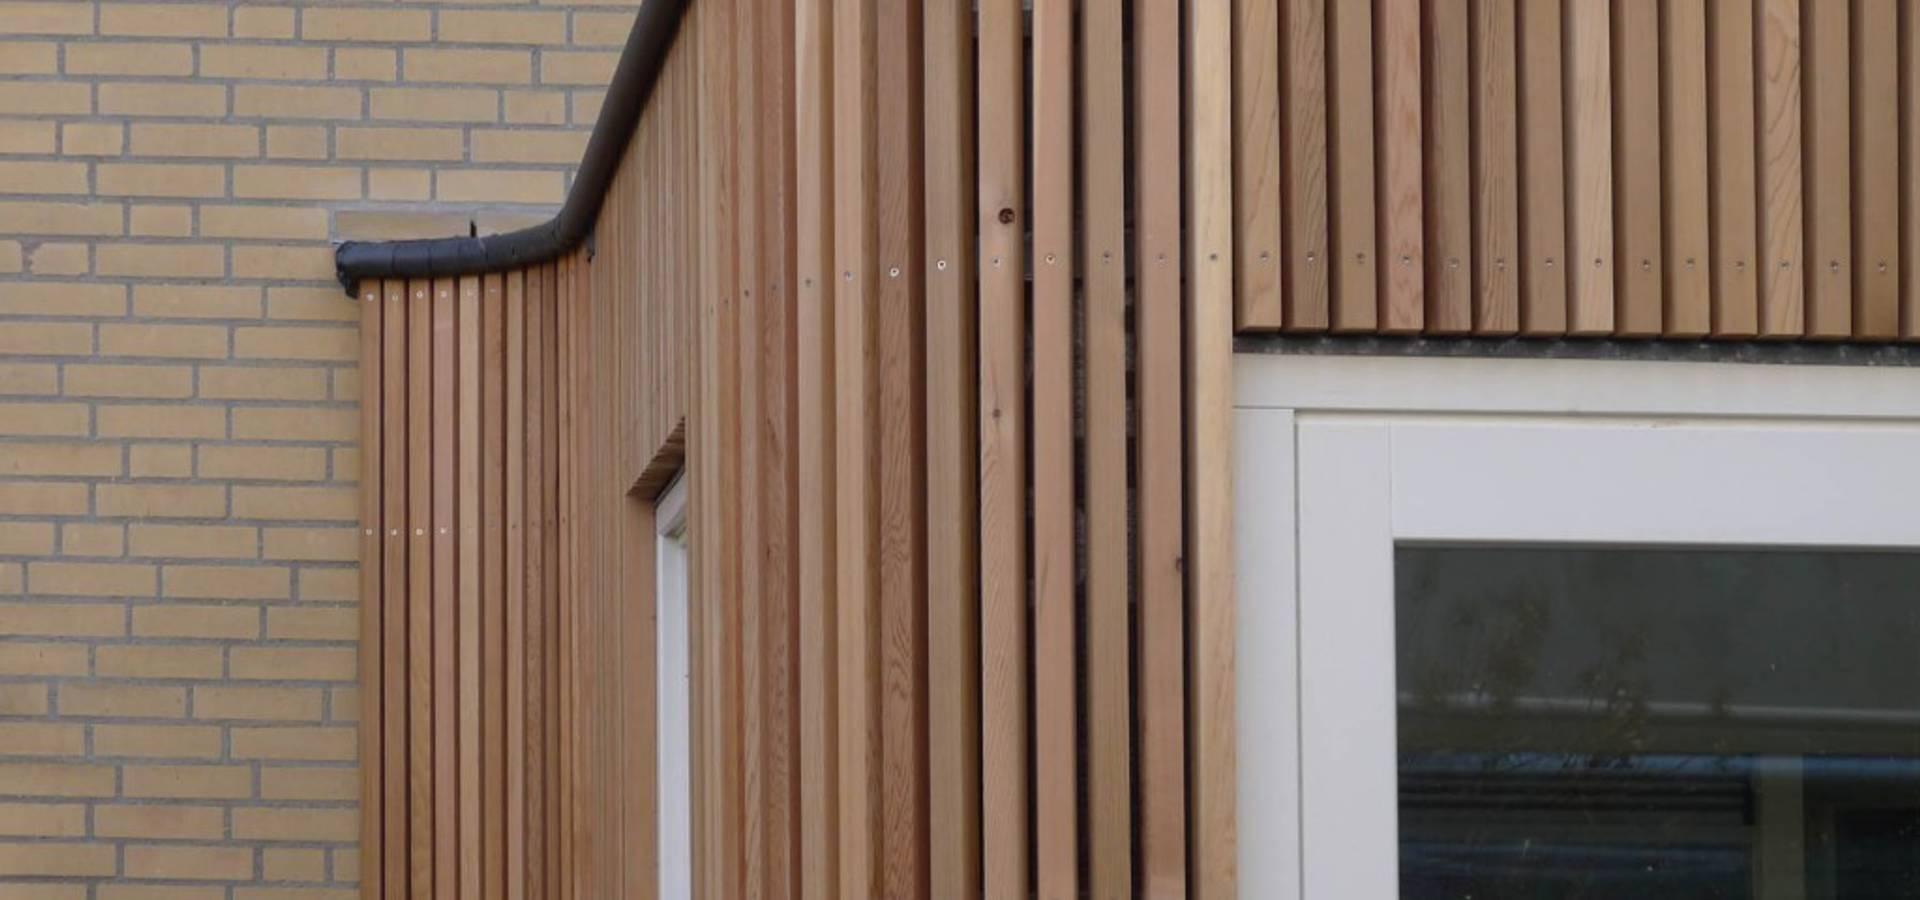 Florian Eckardt—architectinamsterdam